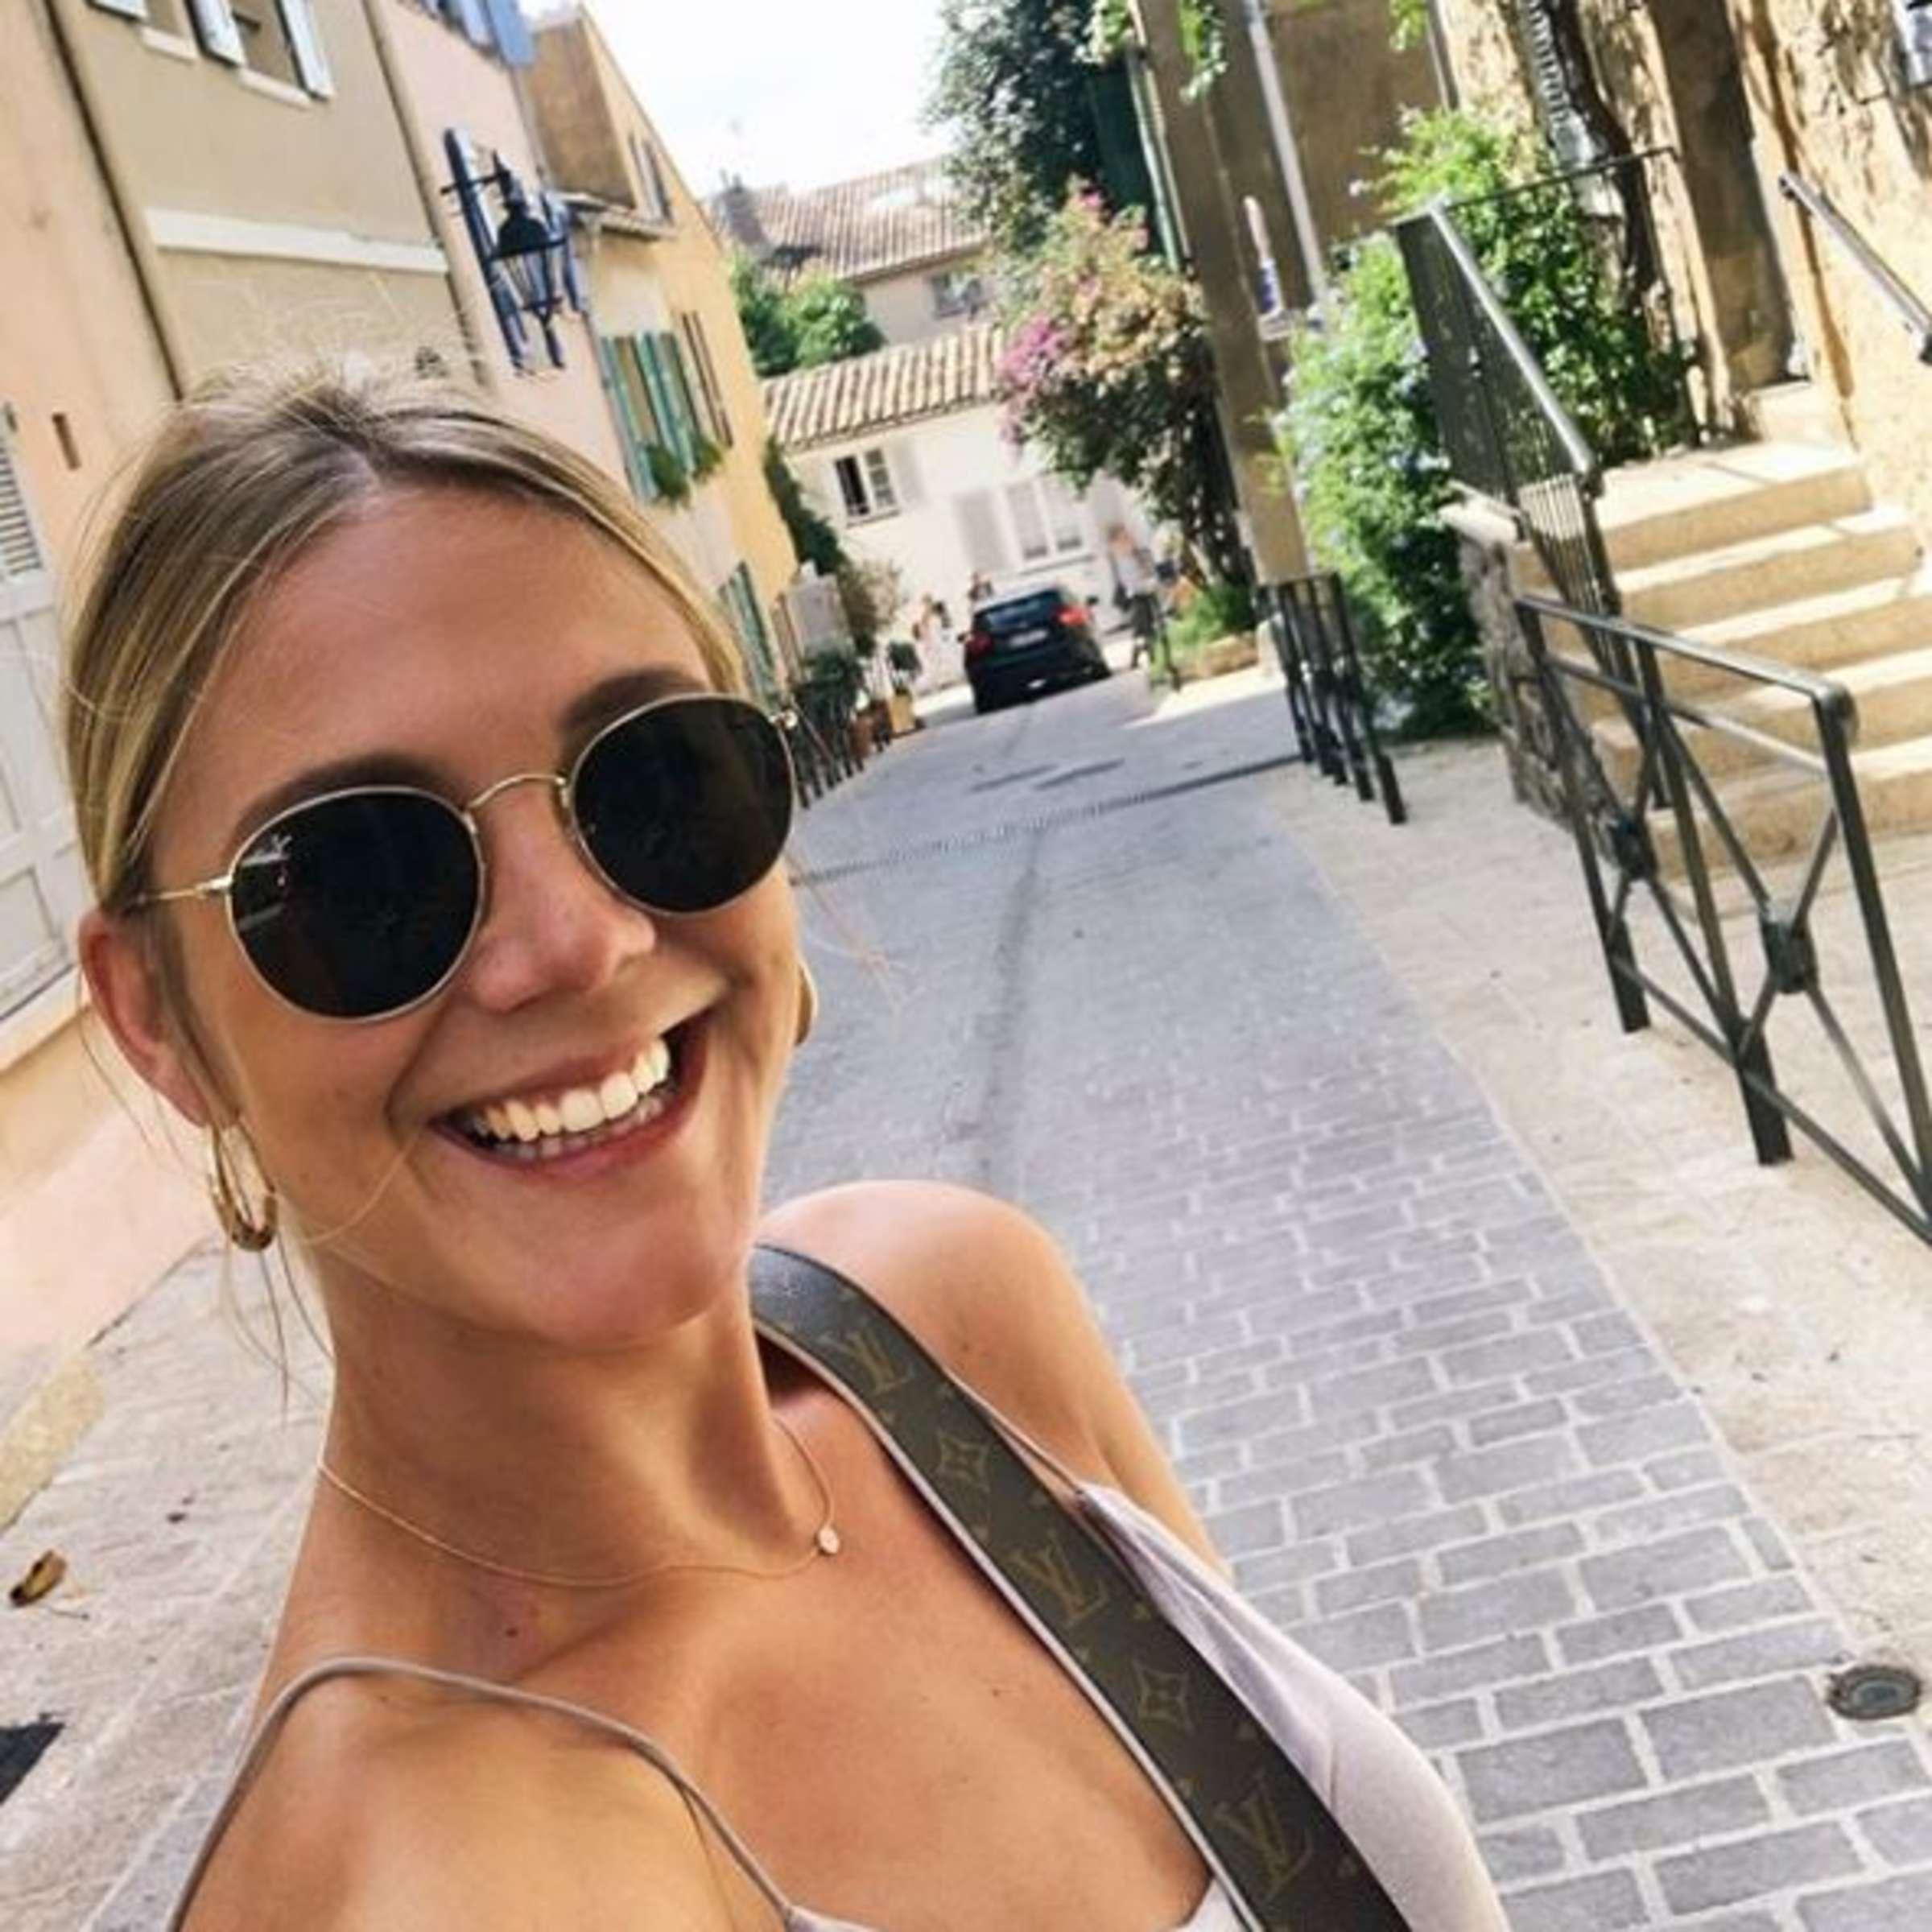 Frühstücksfernsehen sat nackt 1 moderatorin Alina Merkau